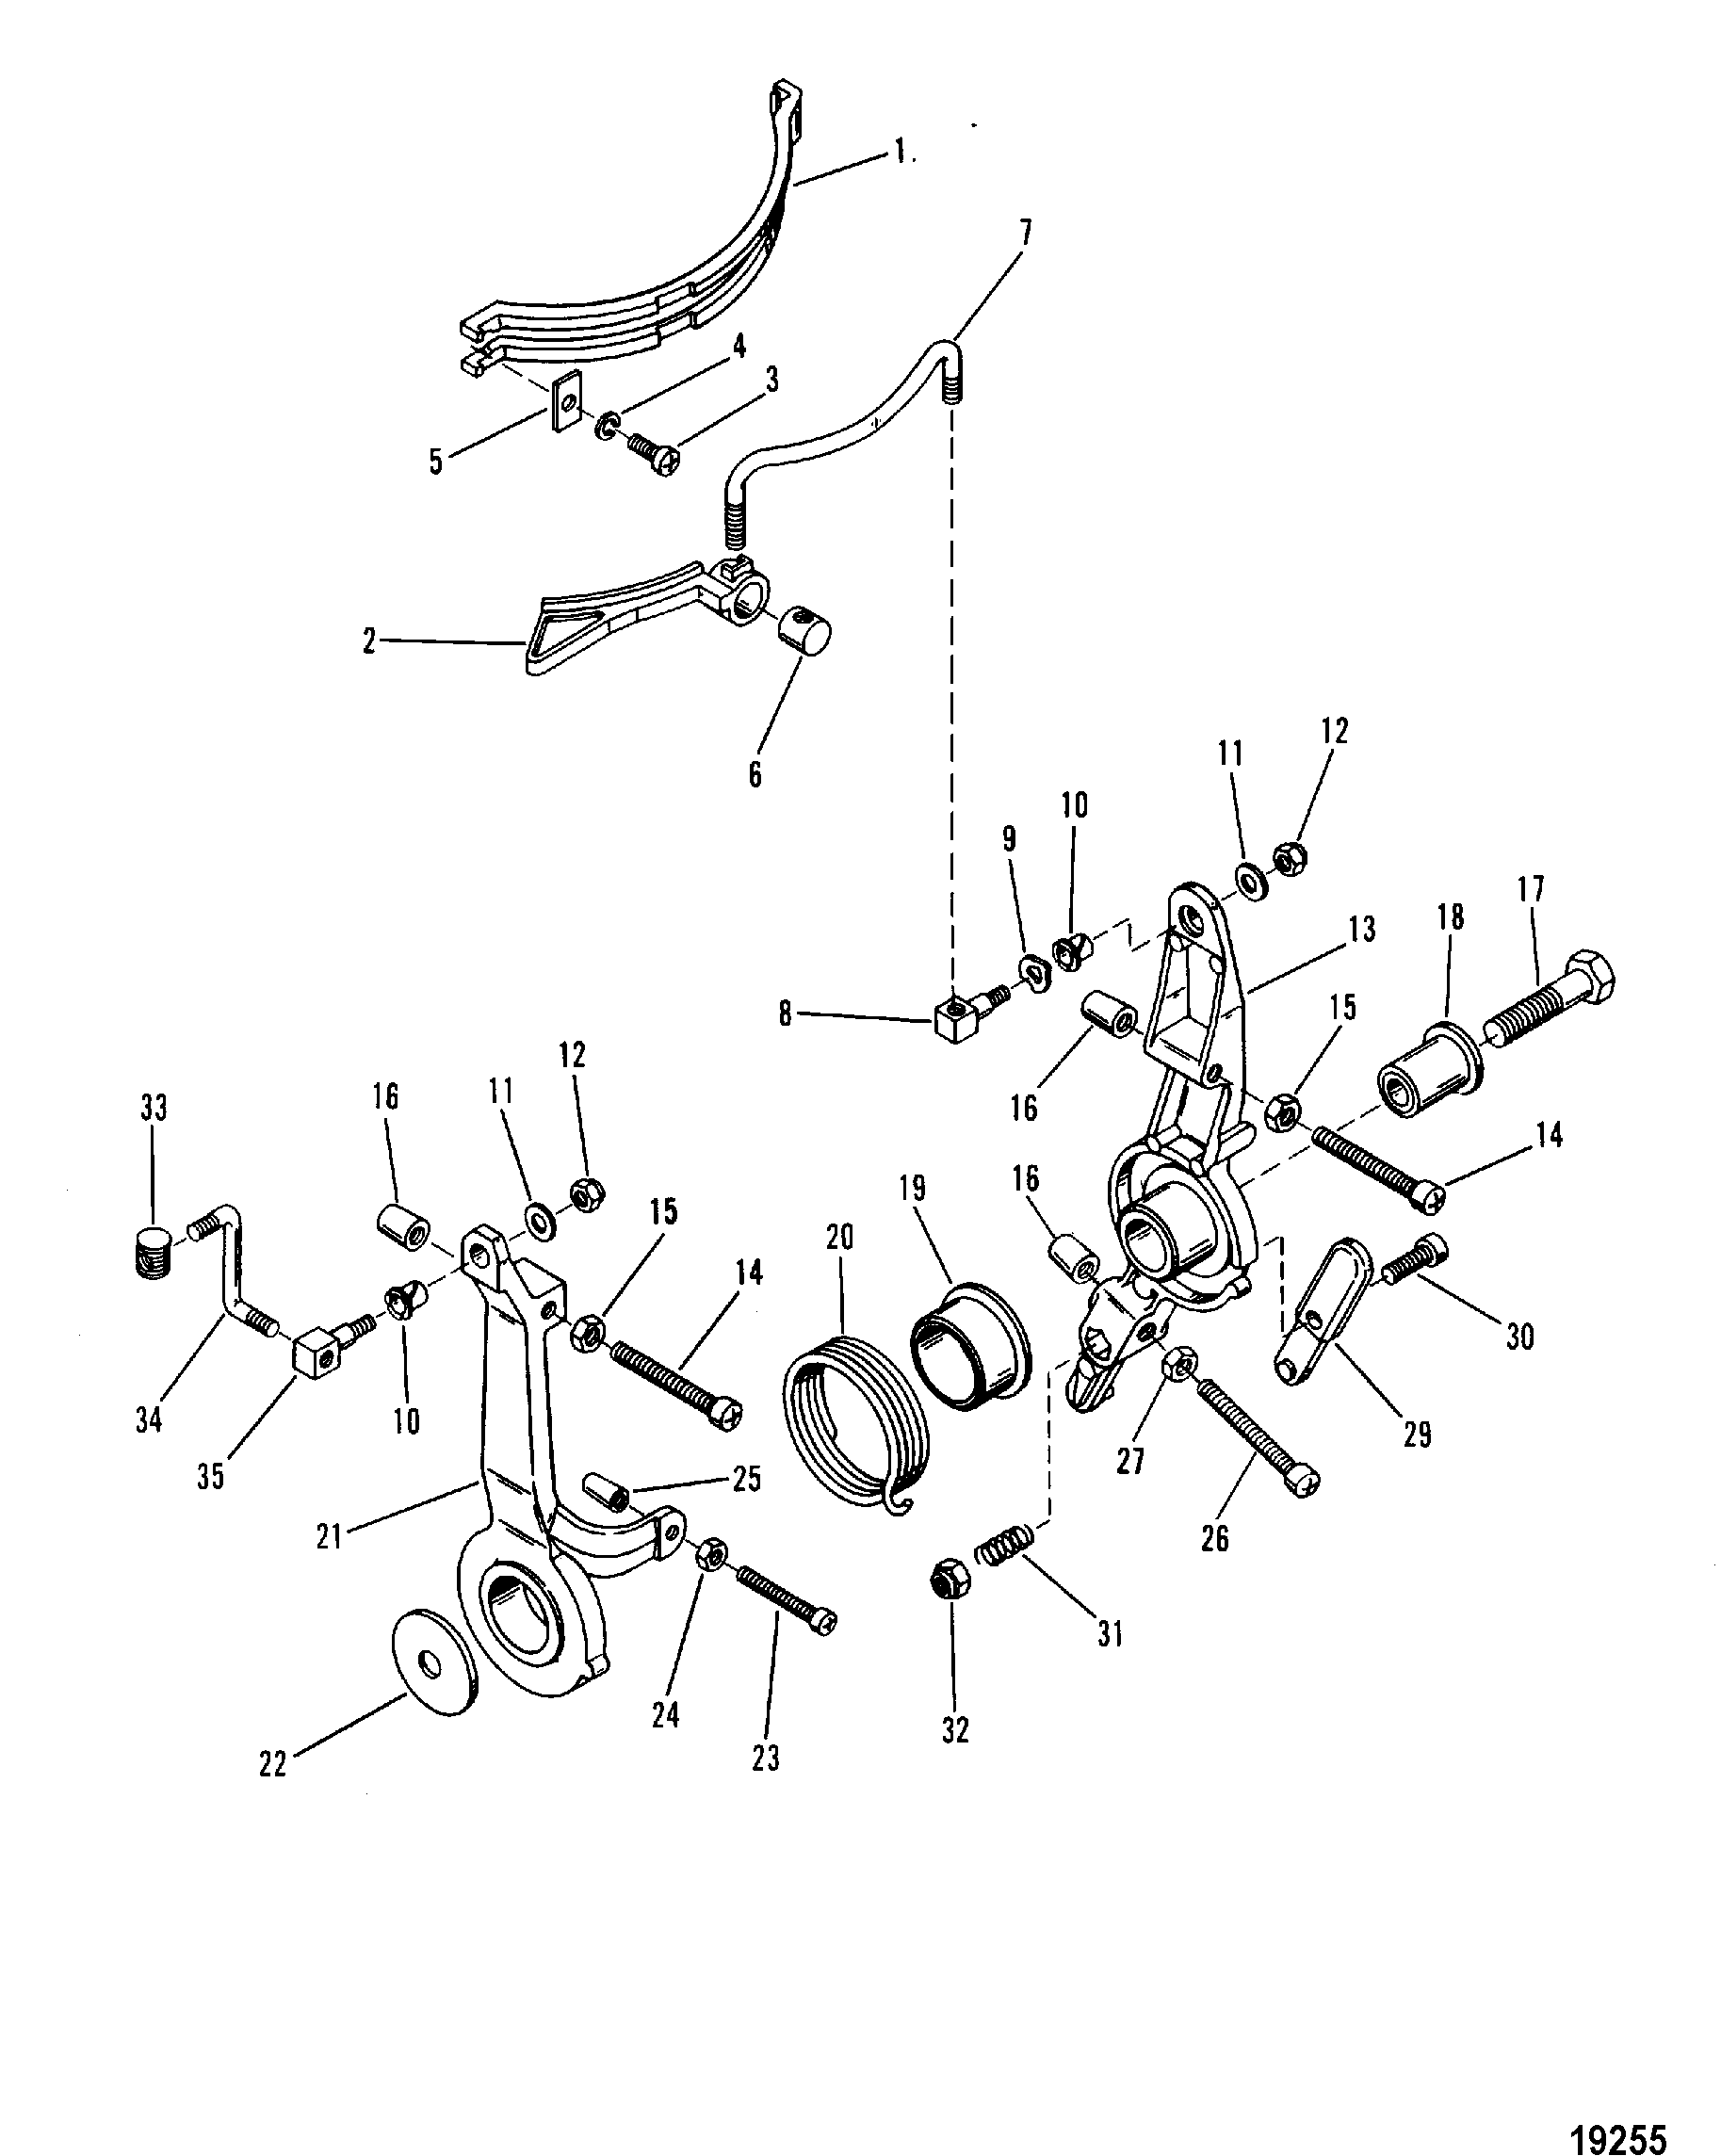 Throttle Linkage For Mariner Mercury 50 60 H P 3 Cylinder